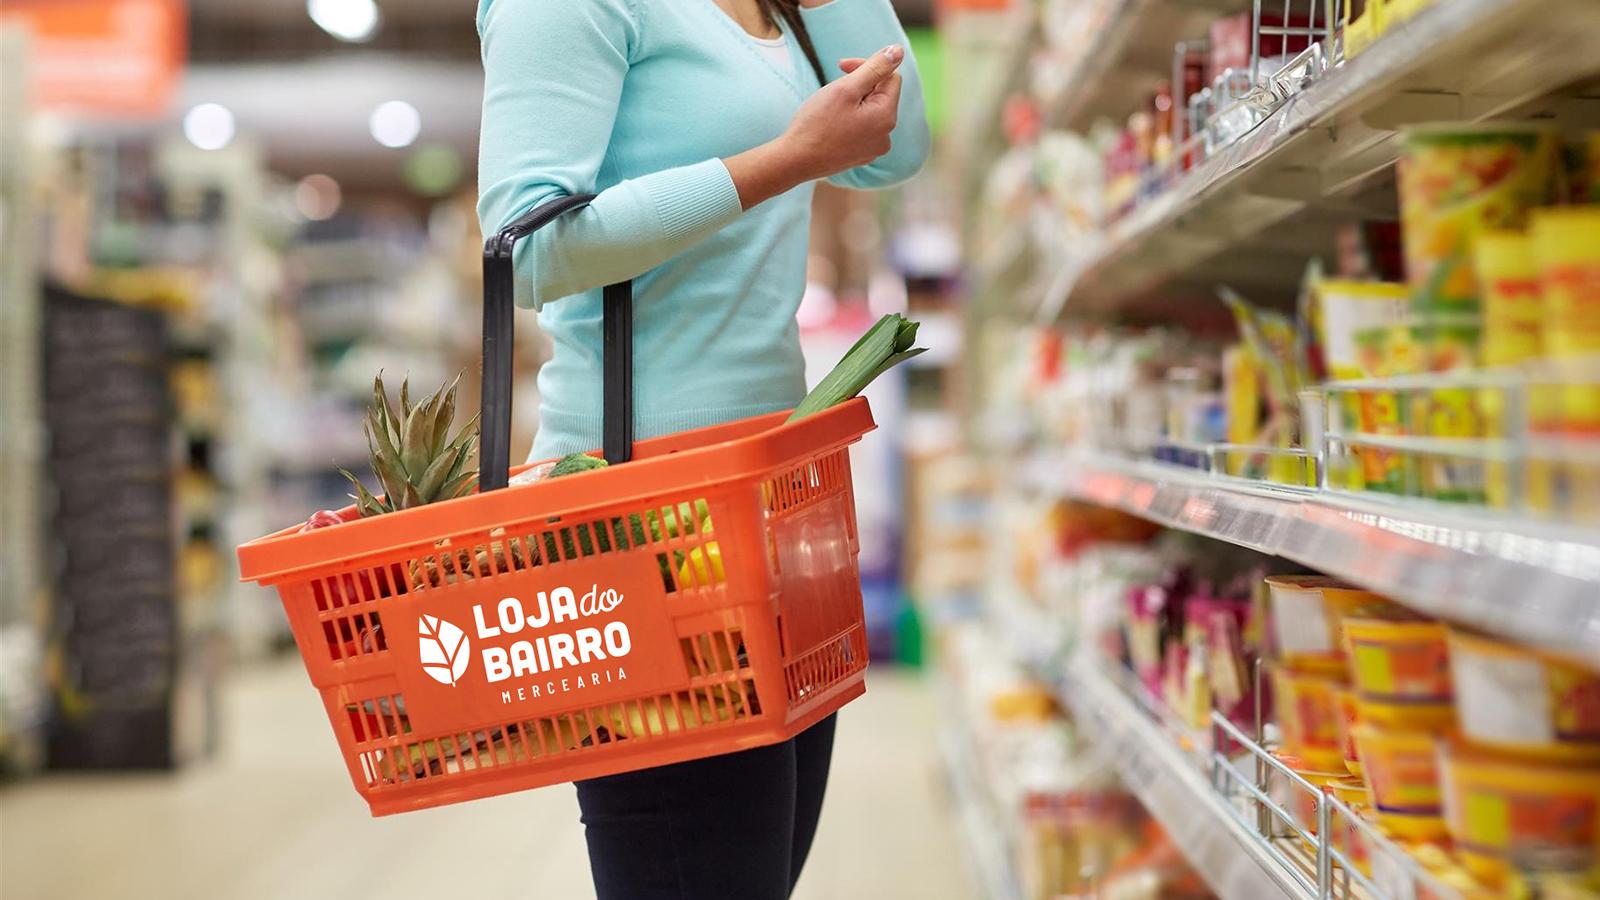 lojadebairro logotipo supermercado